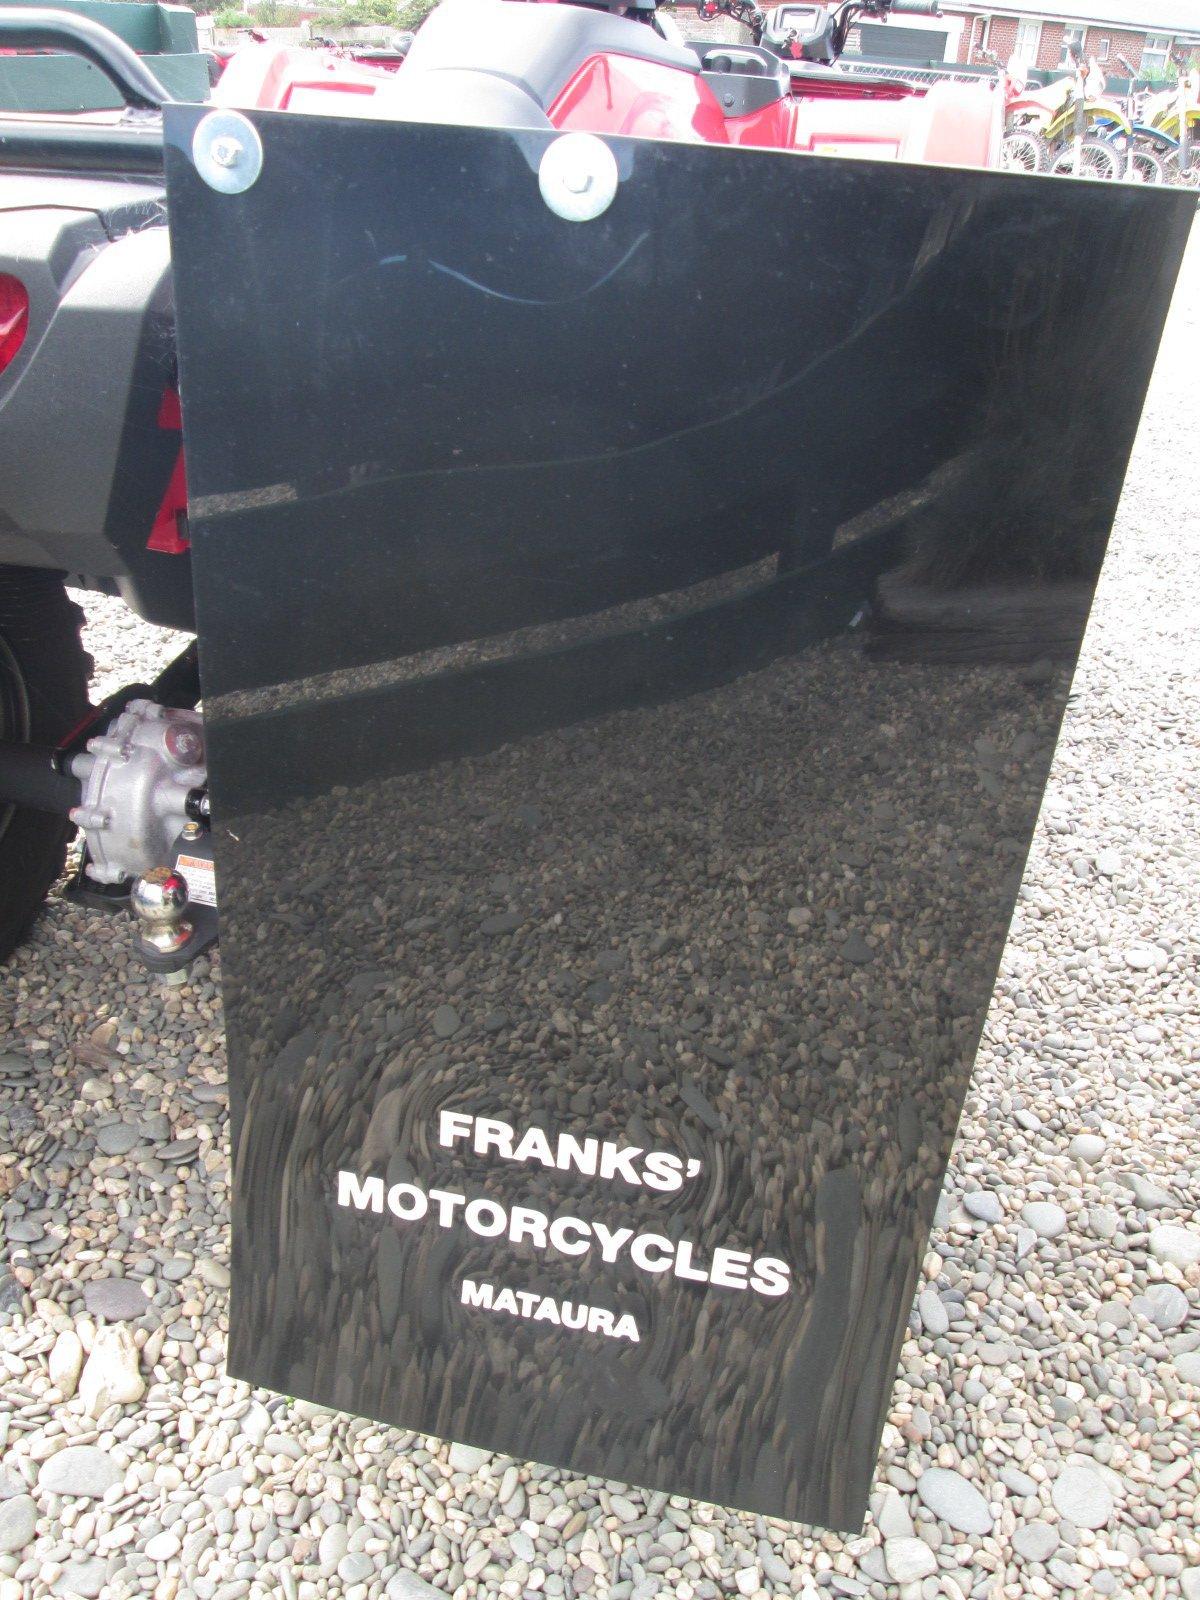 Franks' Motorcycles Mudflap